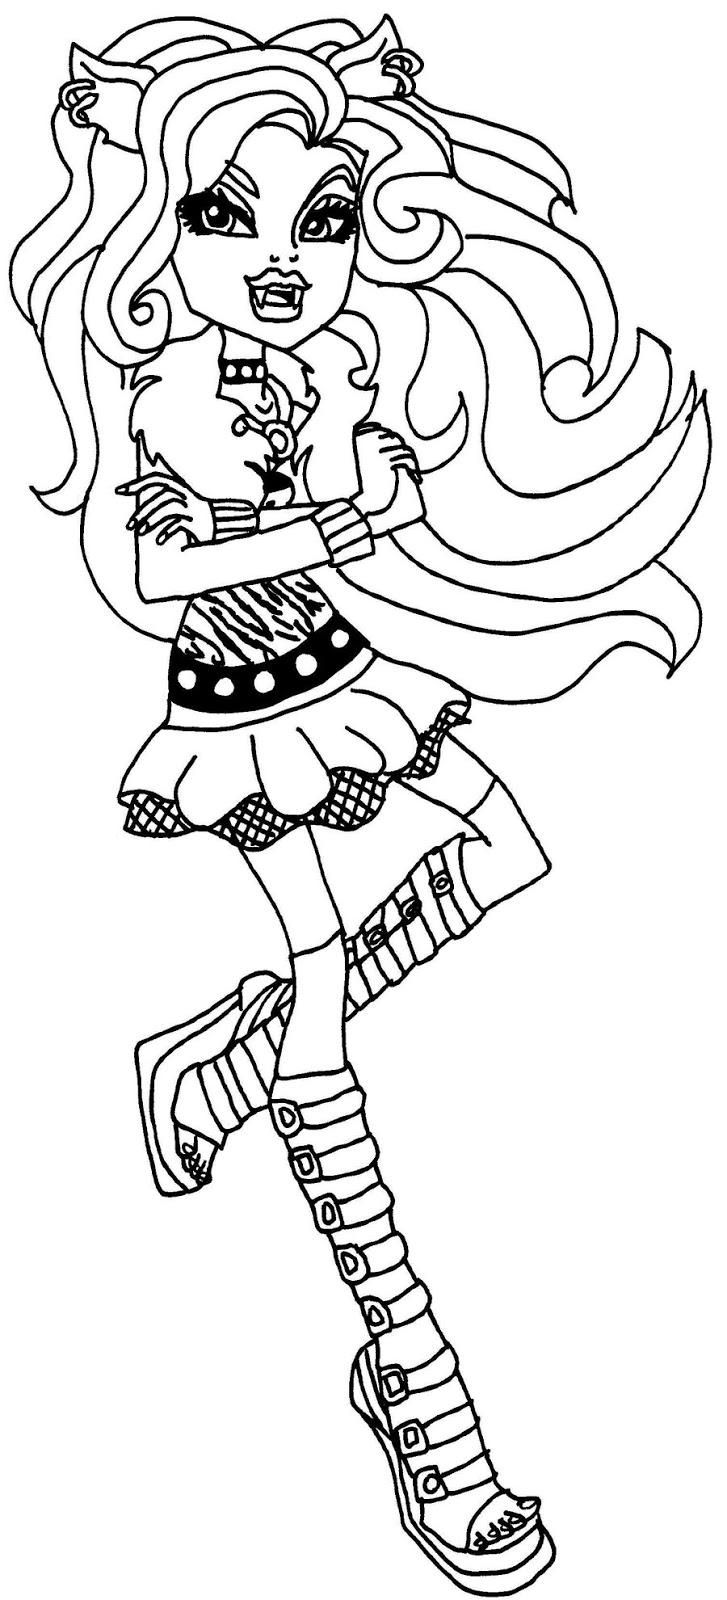 Monster High dibujos para imprimir y colorear: Dibujos Monster High Clawdeen 03